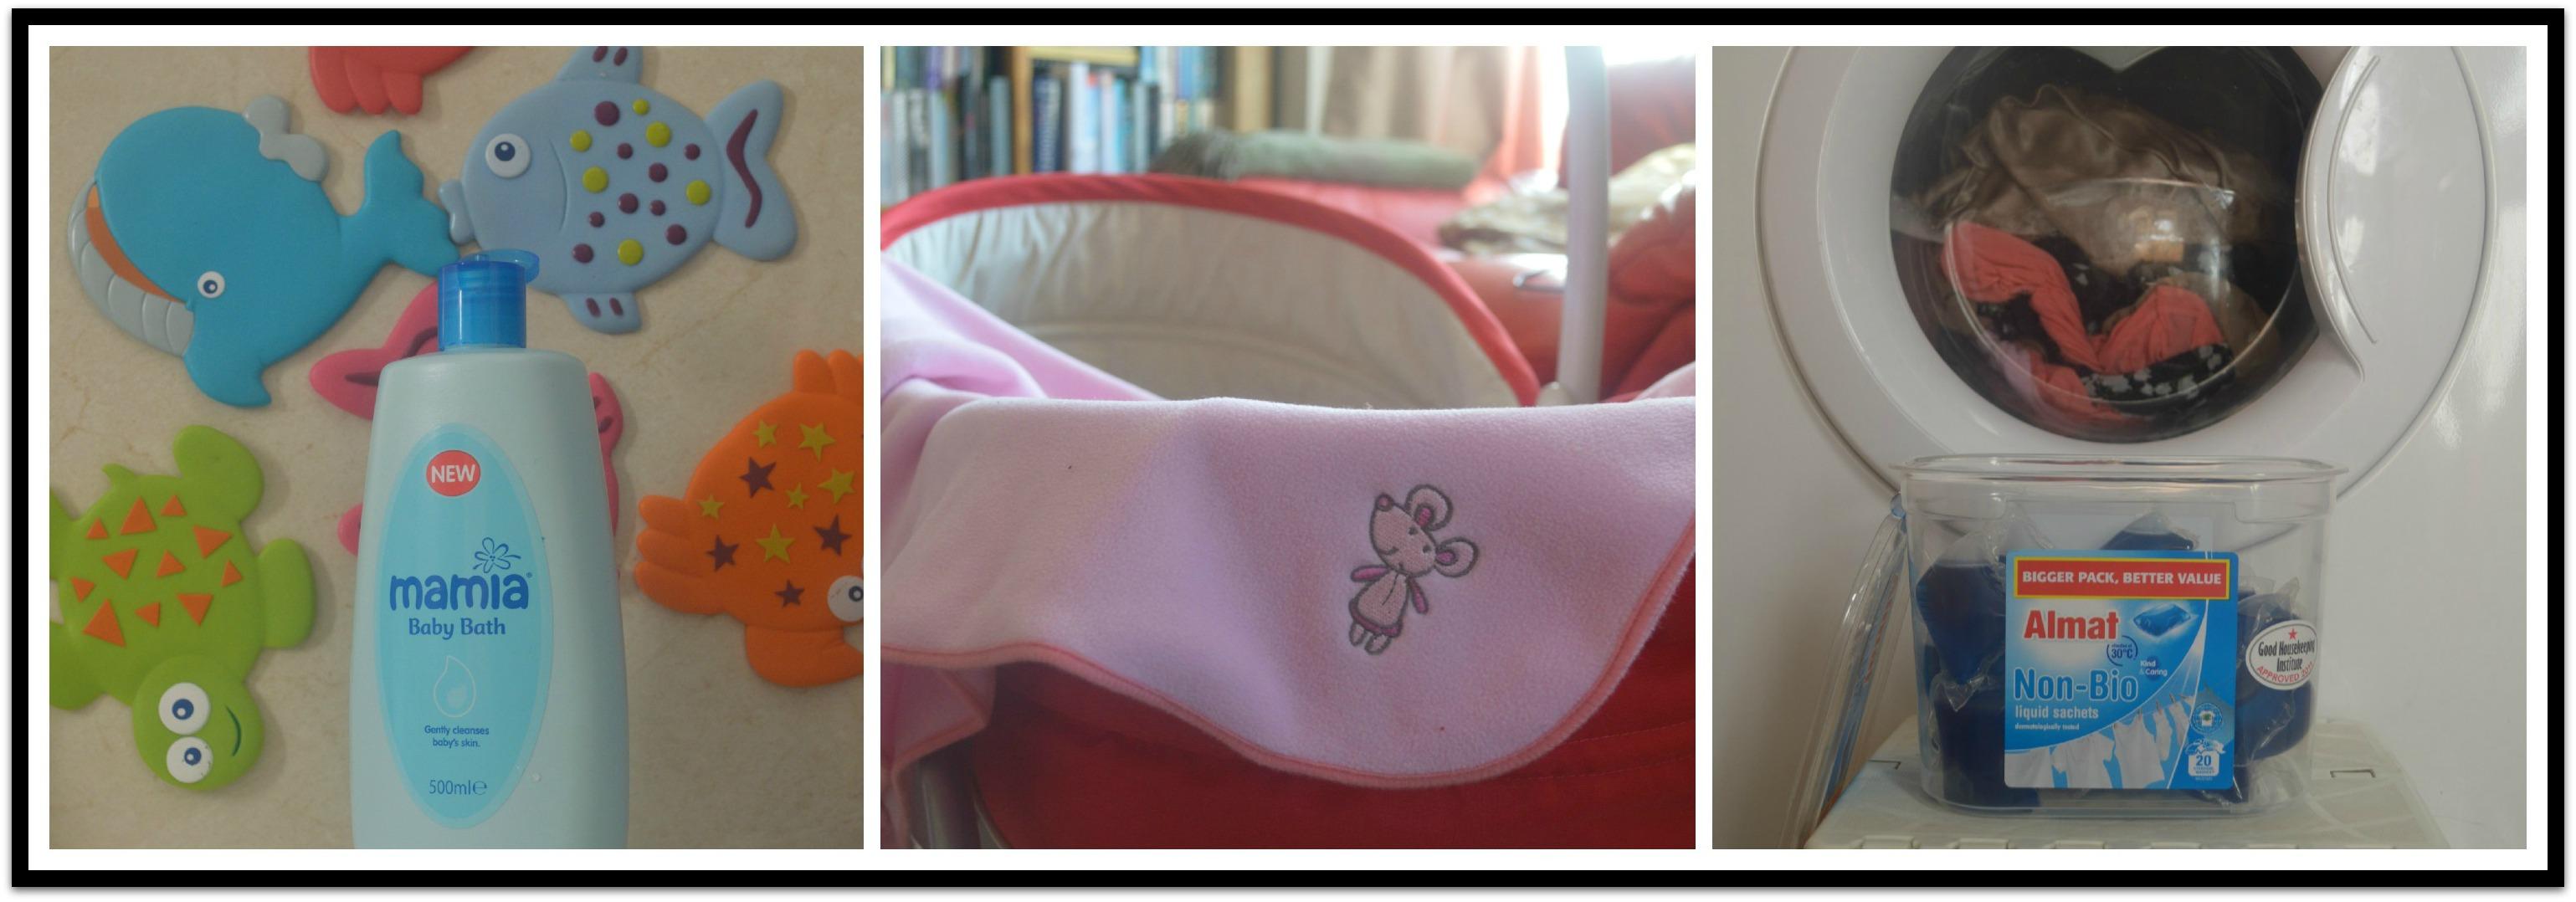 the aldi mamia baby event rocknrollerbaby. Black Bedroom Furniture Sets. Home Design Ideas